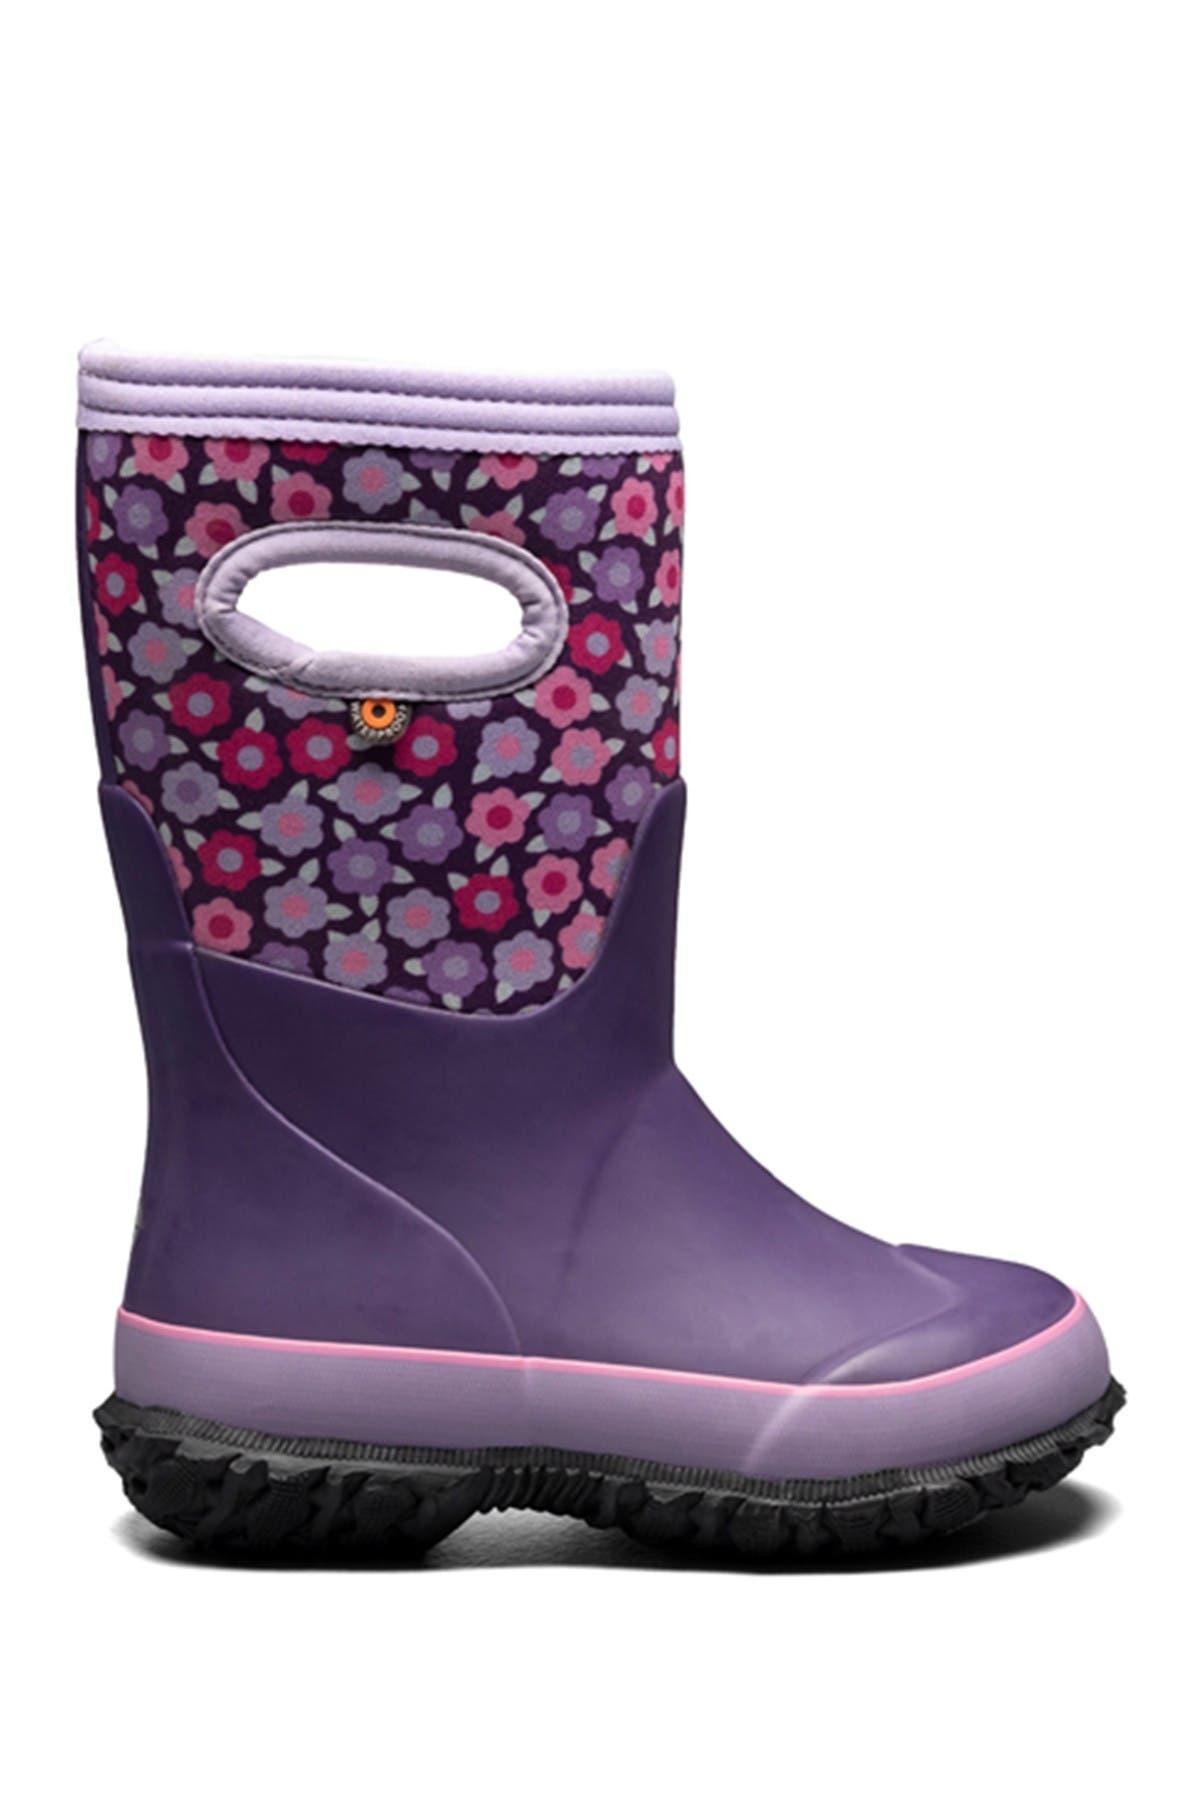 Bogs Grasp Pop Flowers Winter Boot